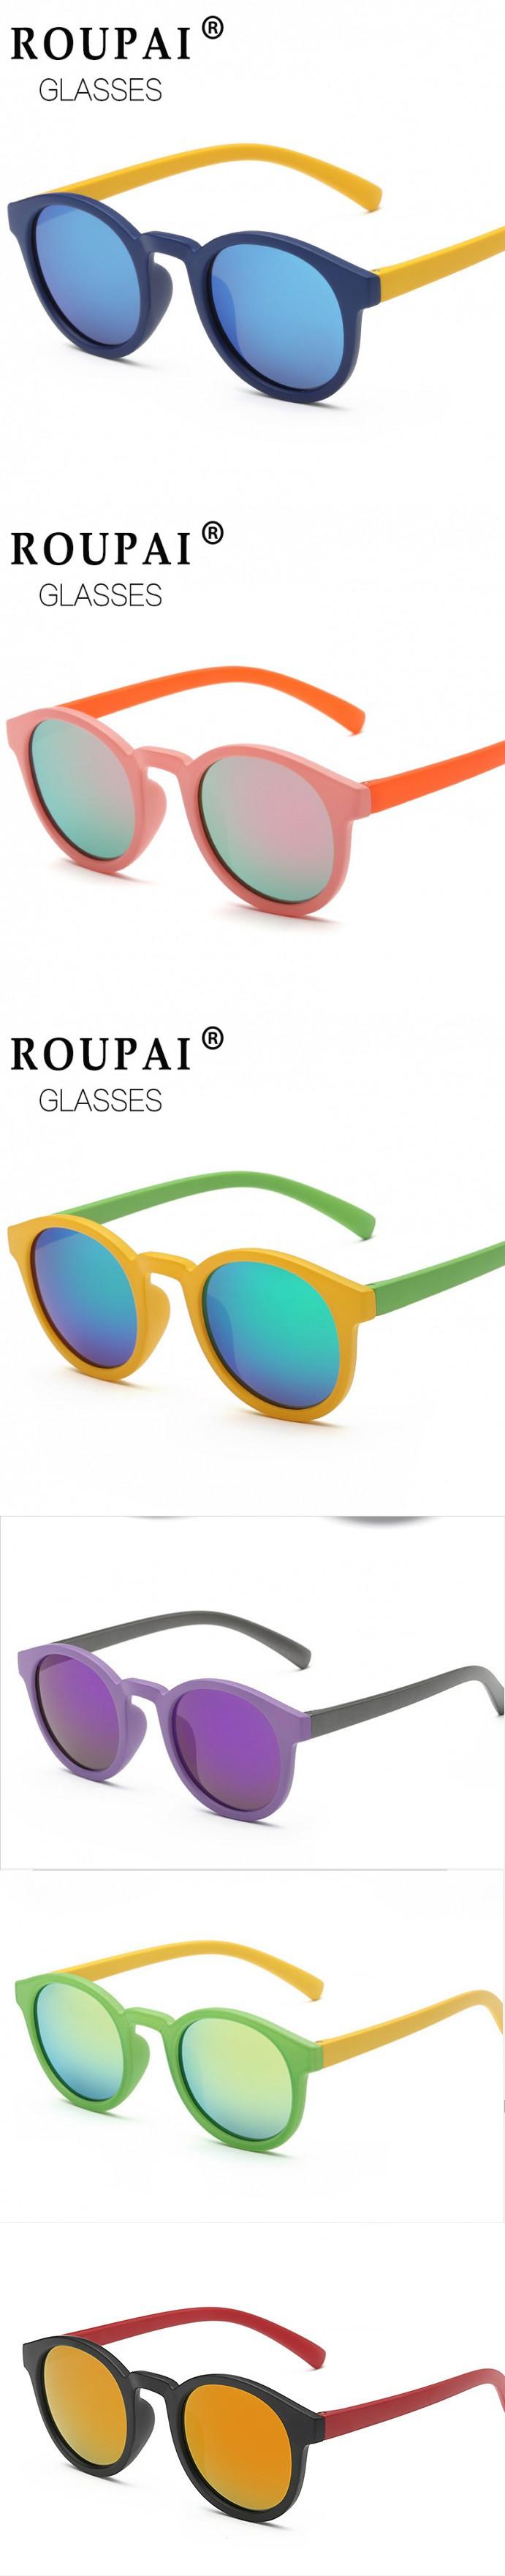 youth oakley eyeglasses eits  Polarized Round Kids Sunglasses Children Sun Glasses Anti-uv Baby Vintage  Eyeglasses Outdoor Cool 7 Color oculos infantil de sol